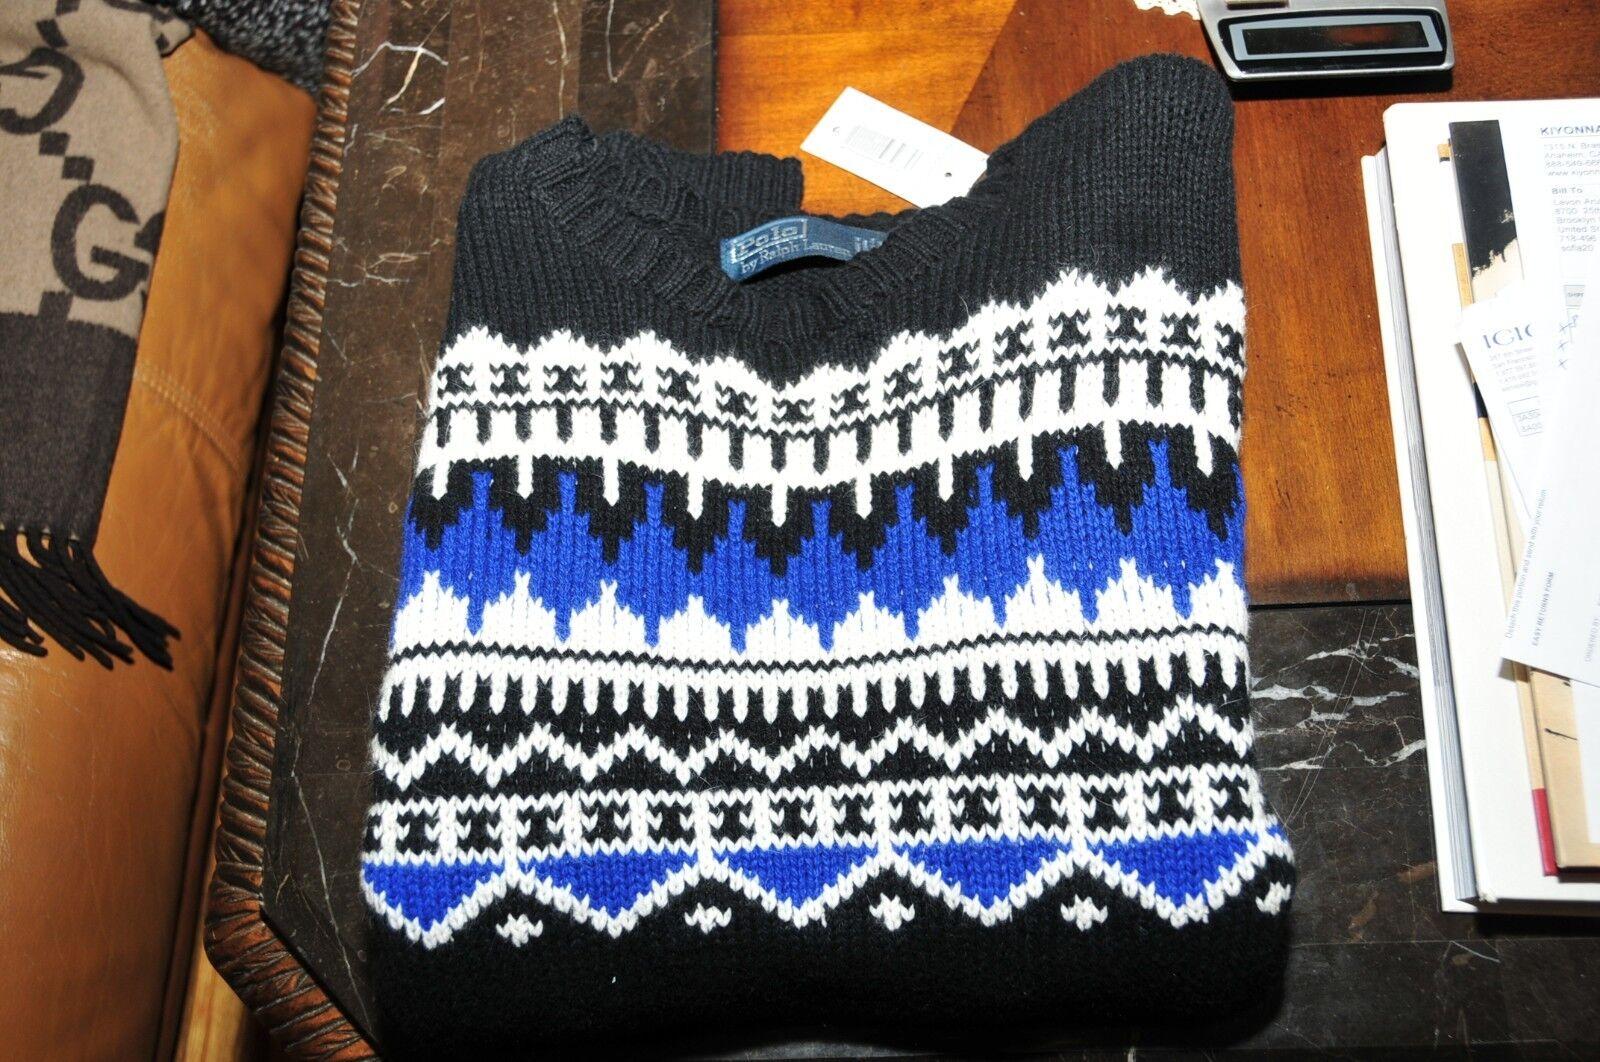 265 NWT NWT NWT autentico Polo Ralph Lauren Uomo Snow Sweater, XL 5110d8